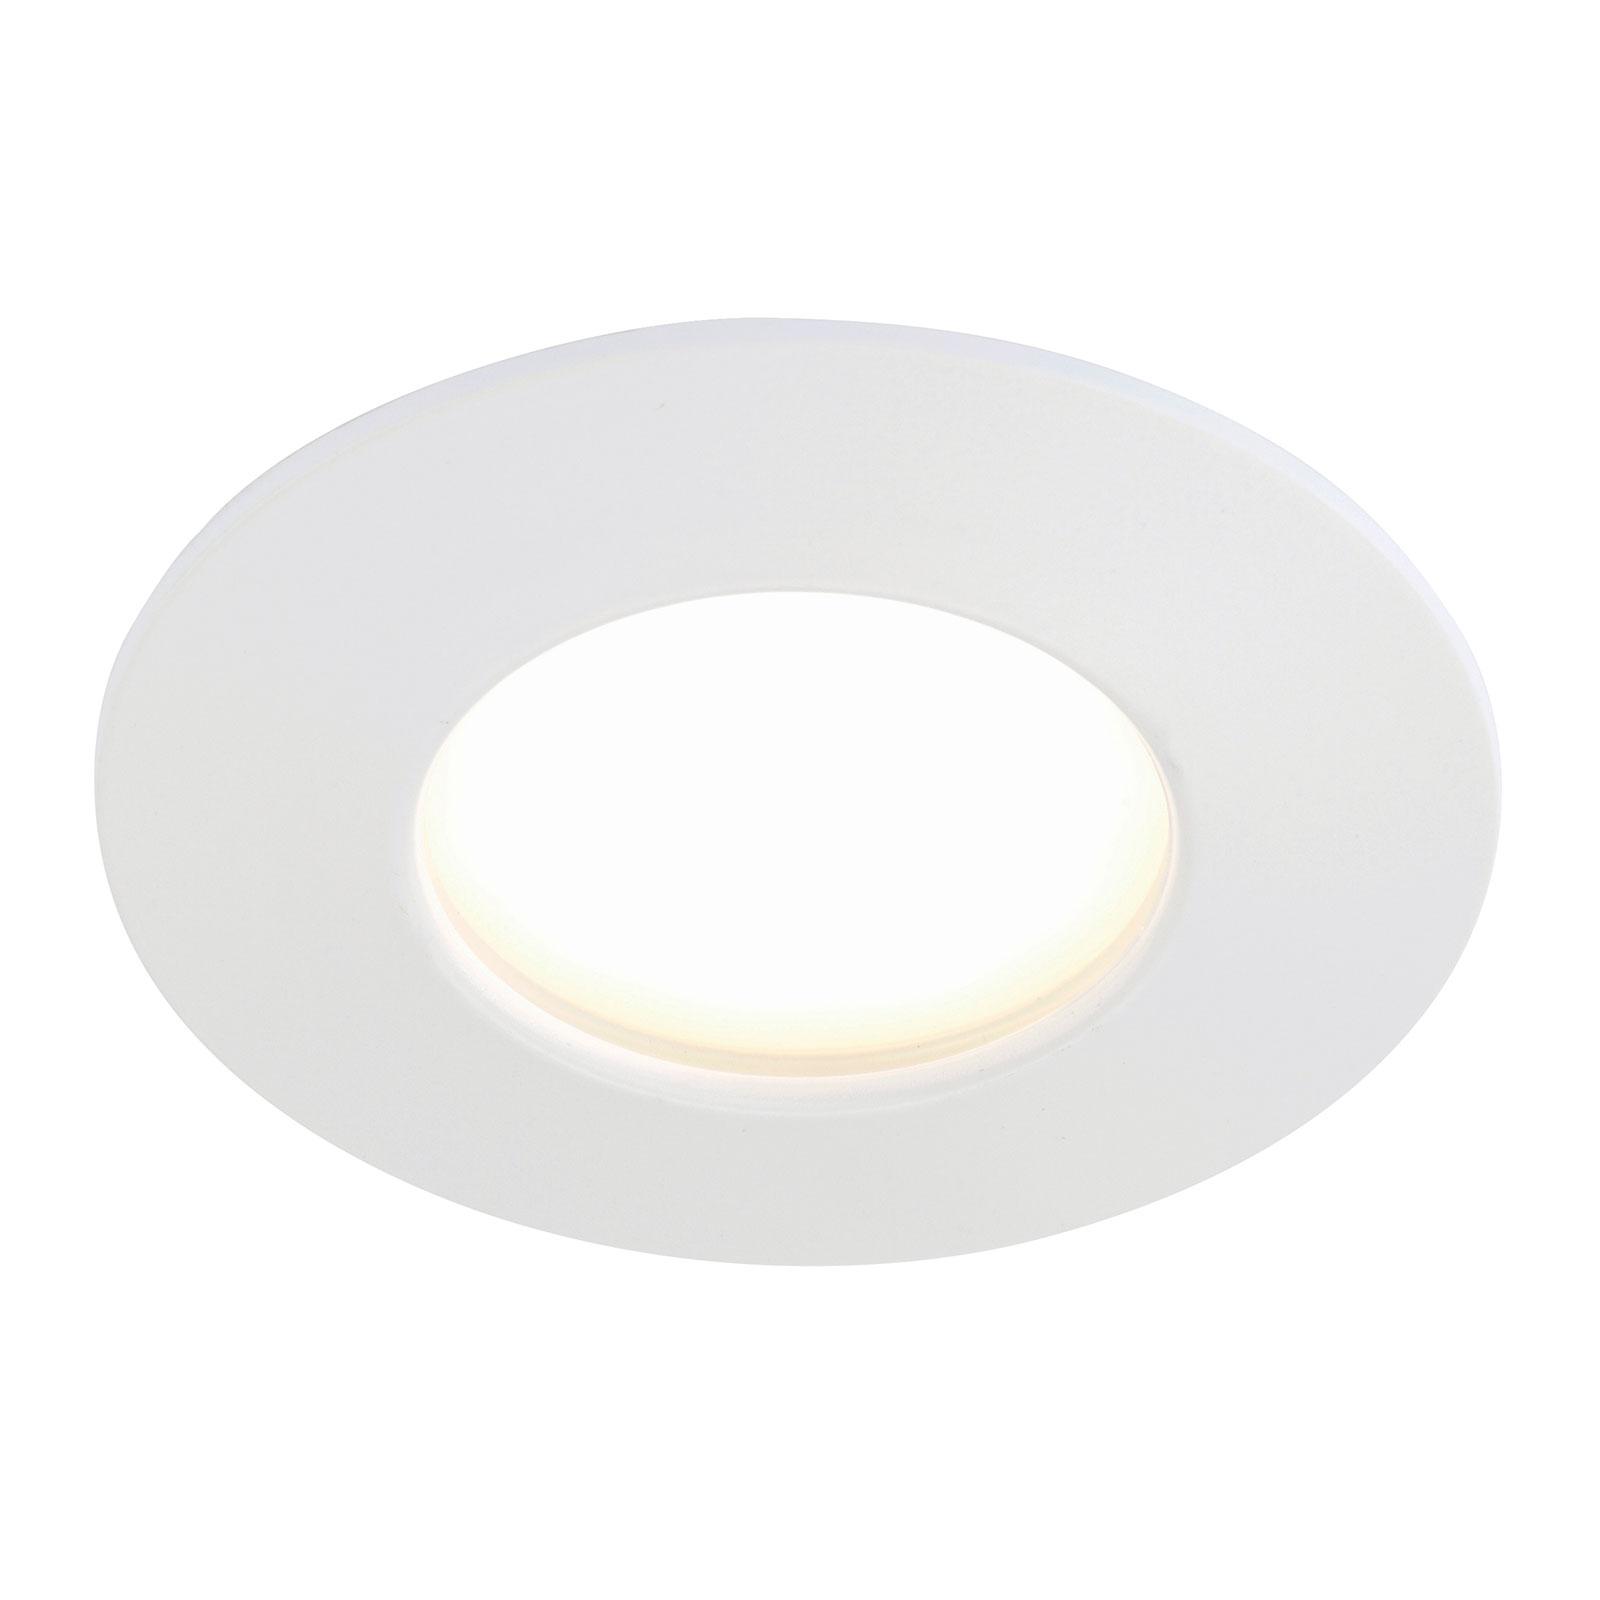 Lámpara LED empotrable Felia blanca, IP44